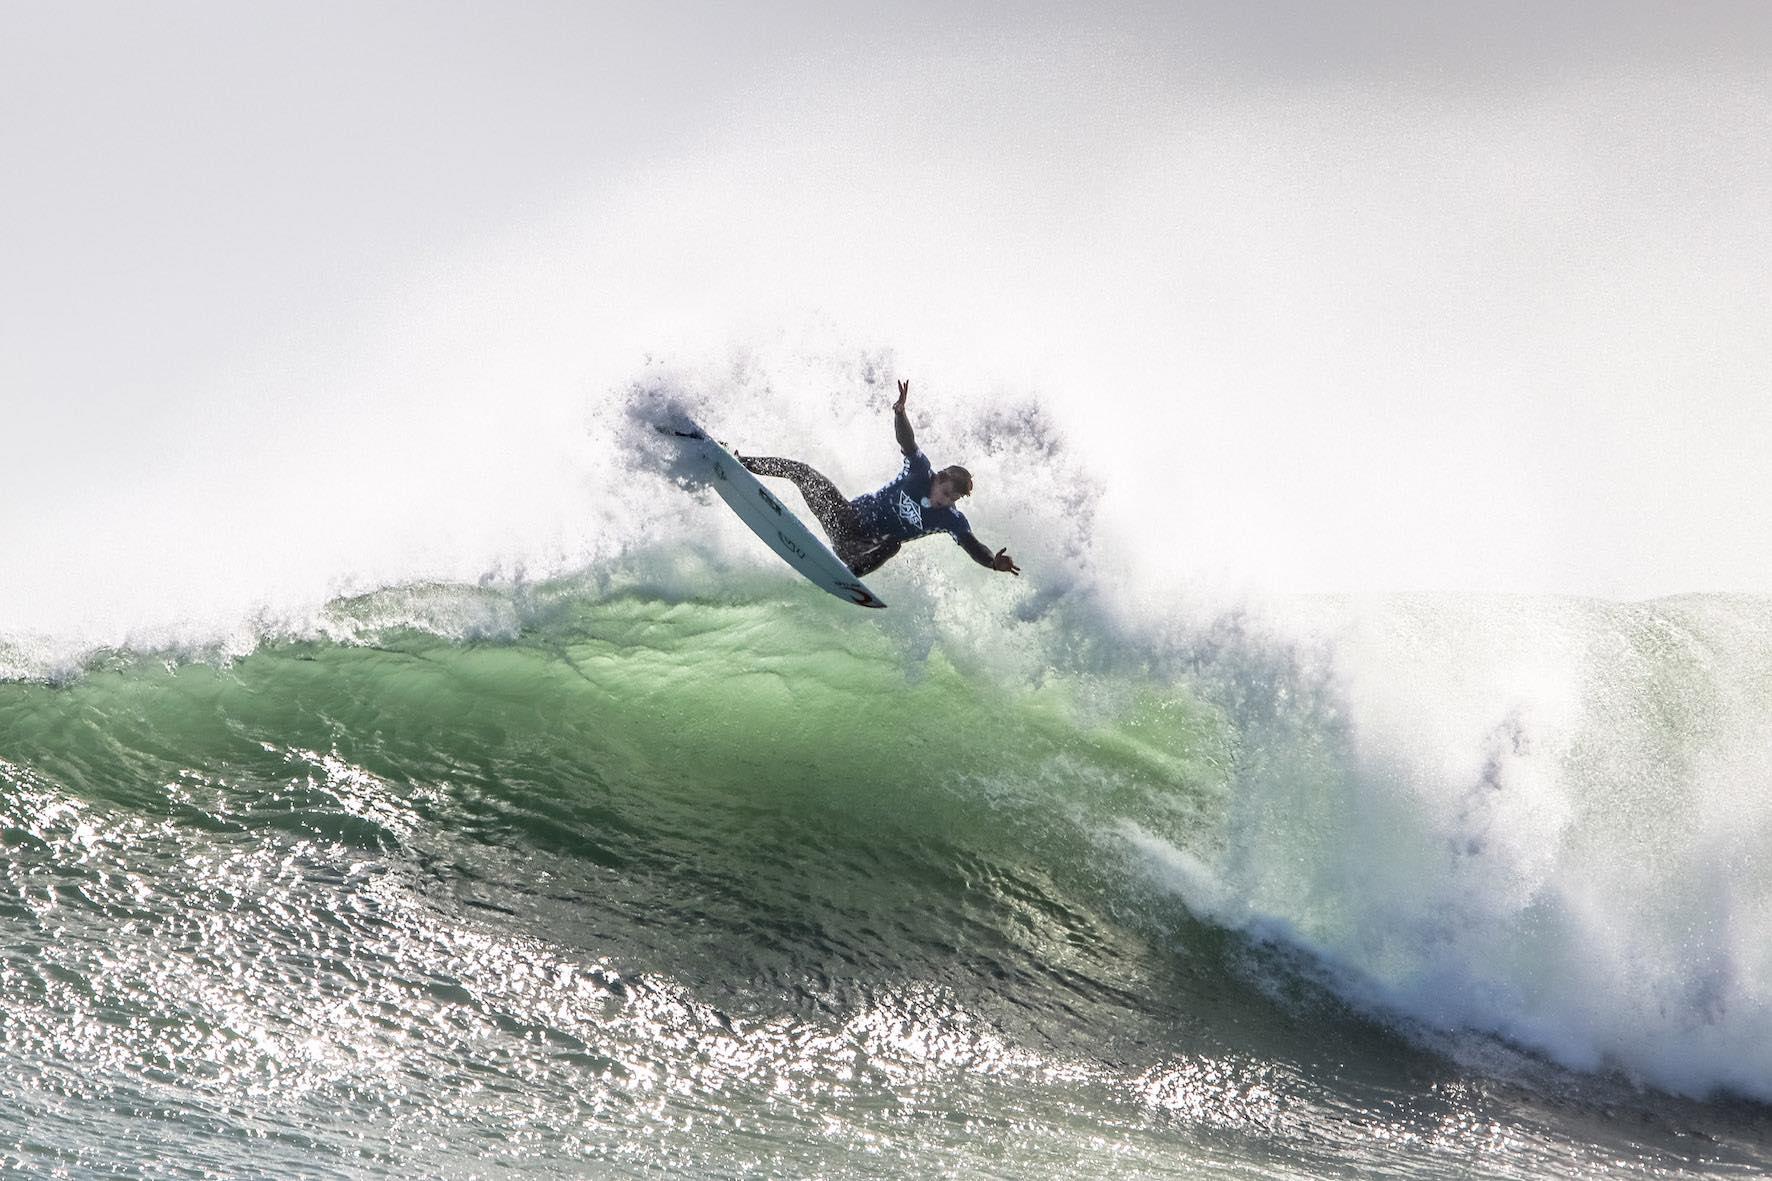 Matt McGillivray wins the Men's surfing category in the 2018 Vans Surf Pro Classic